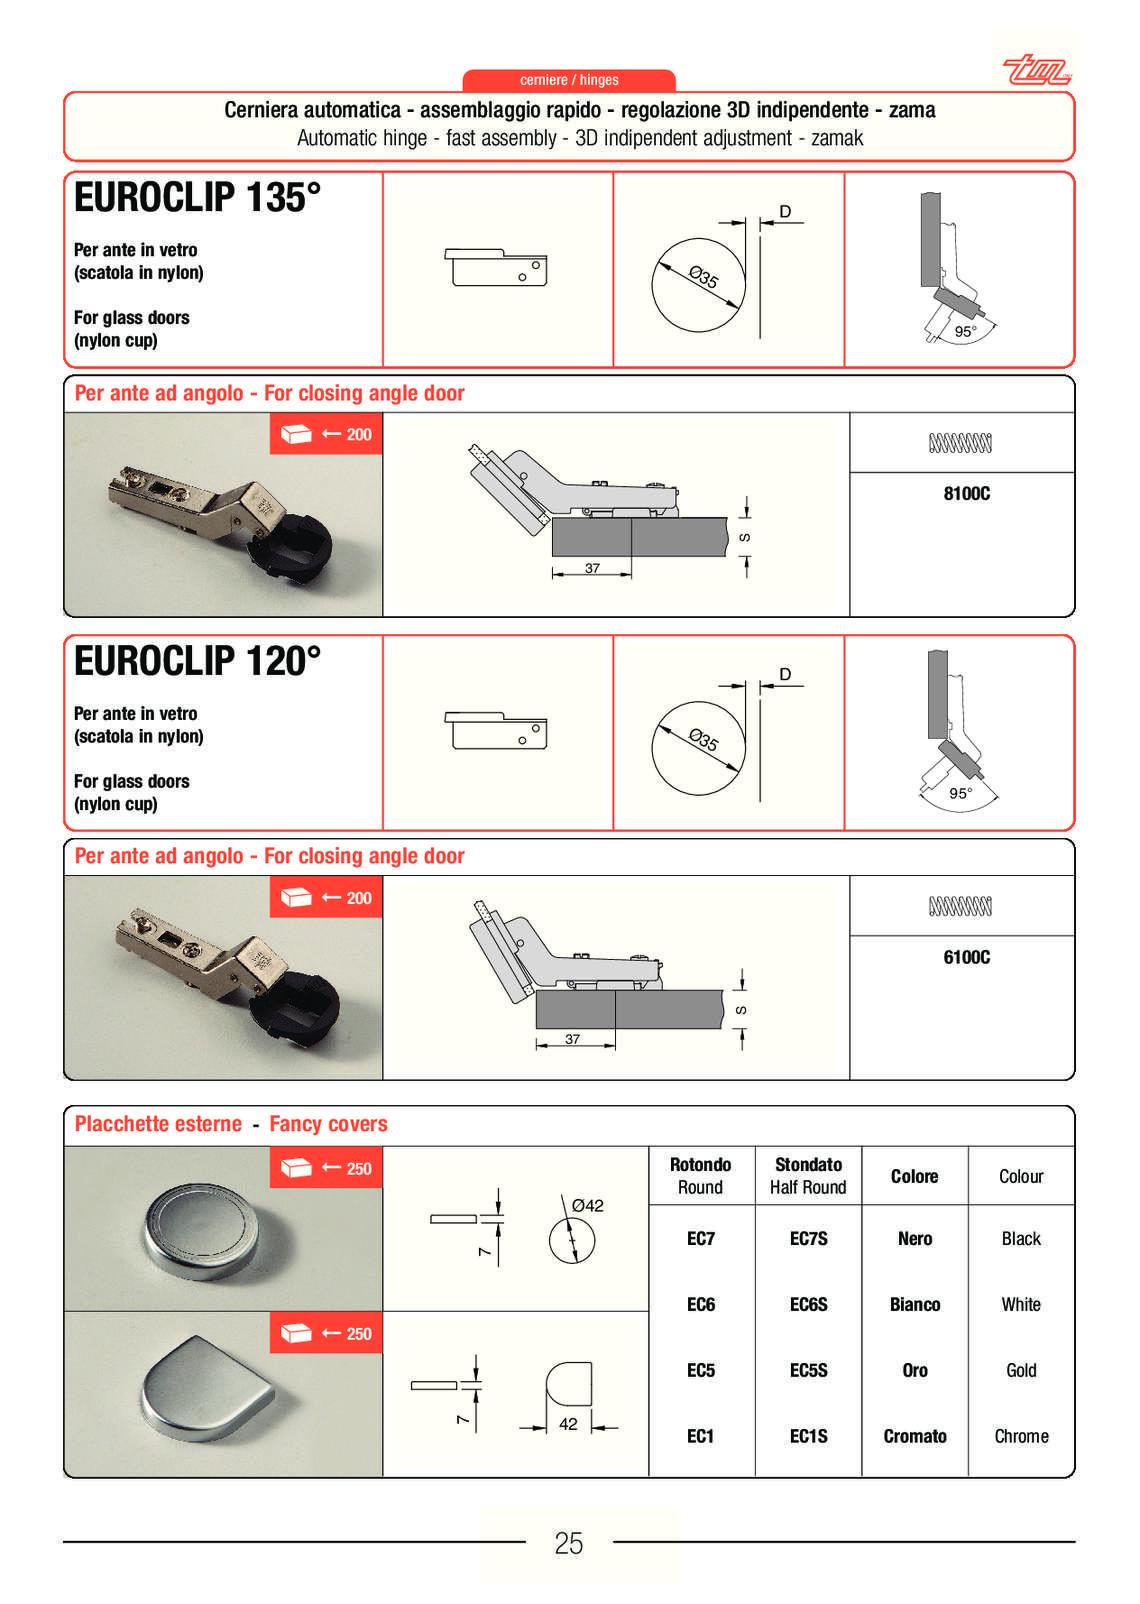 euro-hinges-catalogue_175_024.jpg